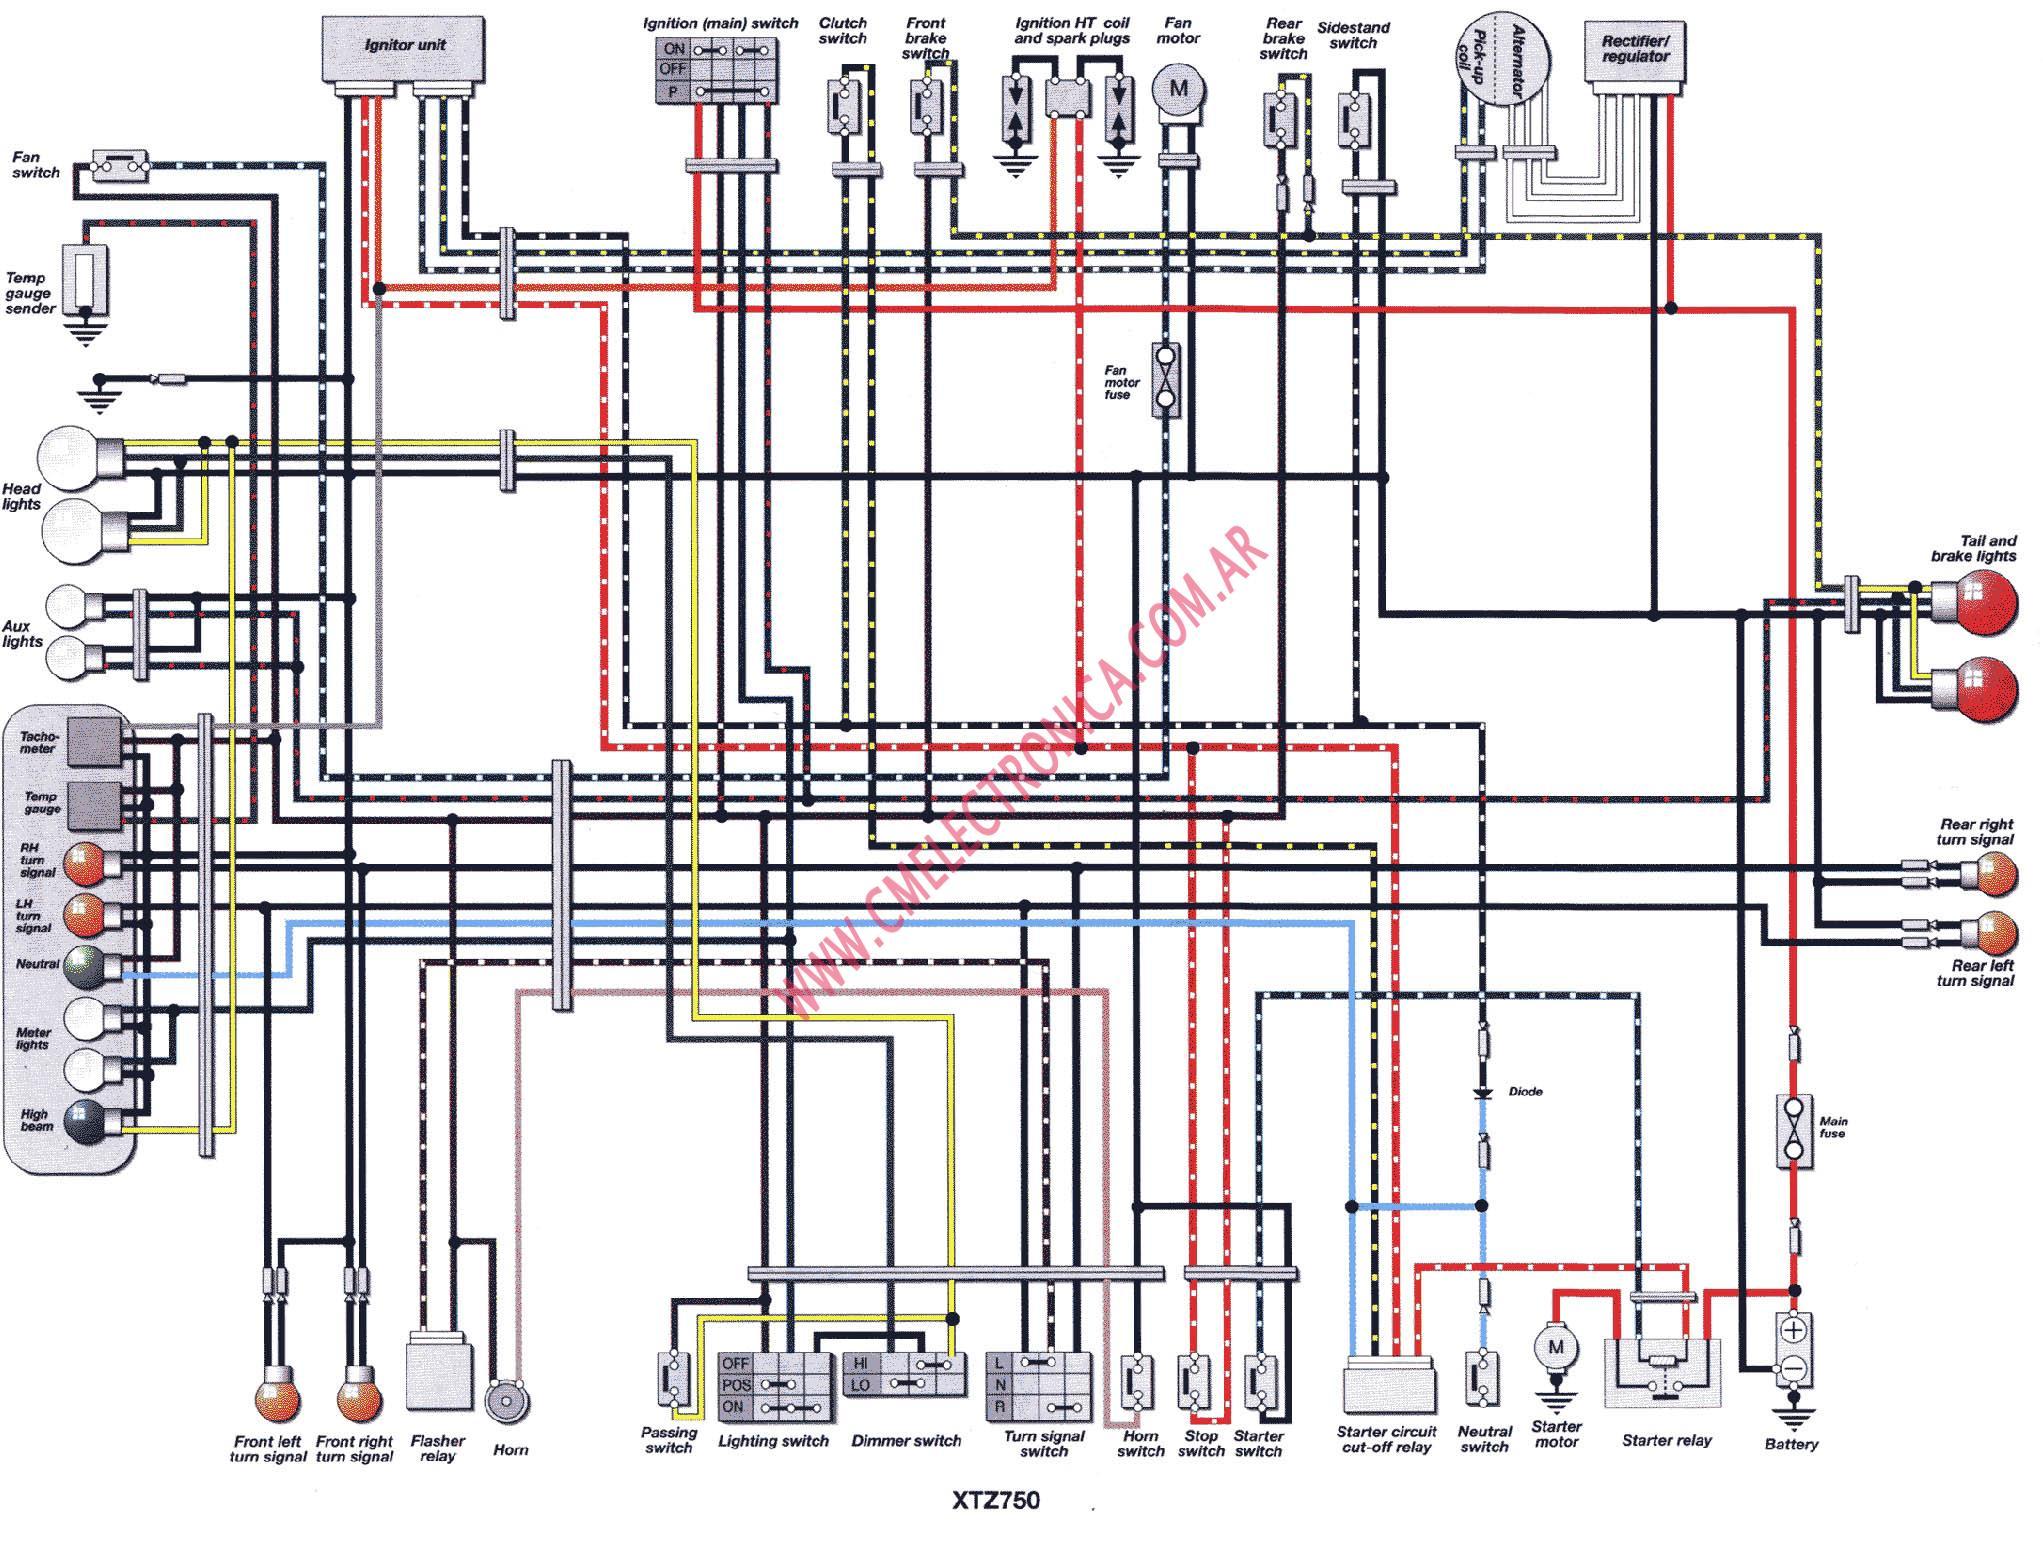 1981 Yamaha Xs650 Wiring Diagram Auto Electrical 650 Schematics 1982